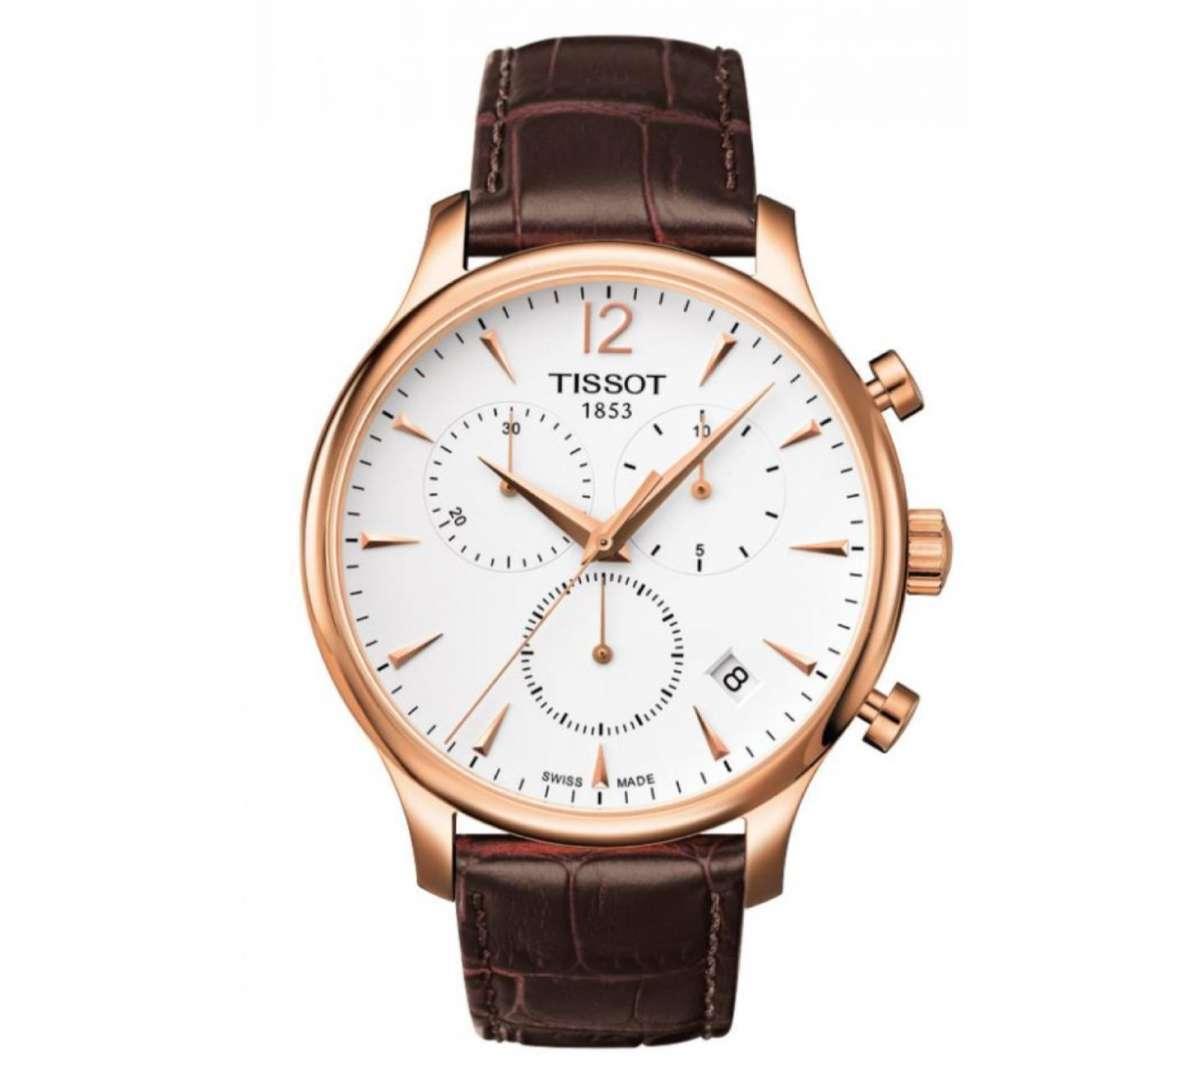 שעון יד אנלוגי tissot t063.617.36.037.00 טיסו